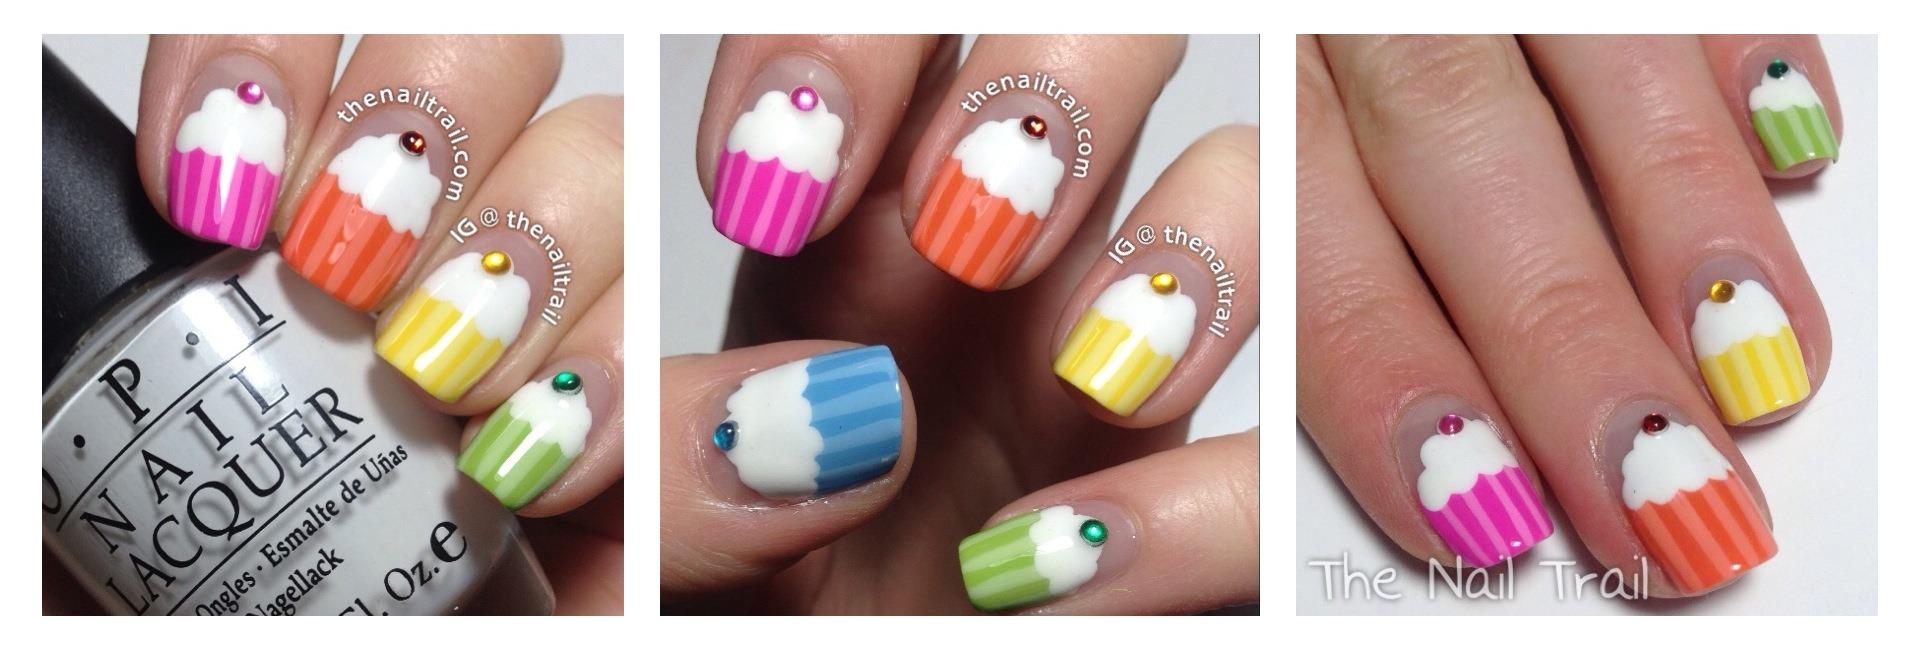 Nail art cupcake nail art designs cupcakenailart2 cupcake1 prinsesfo Gallery